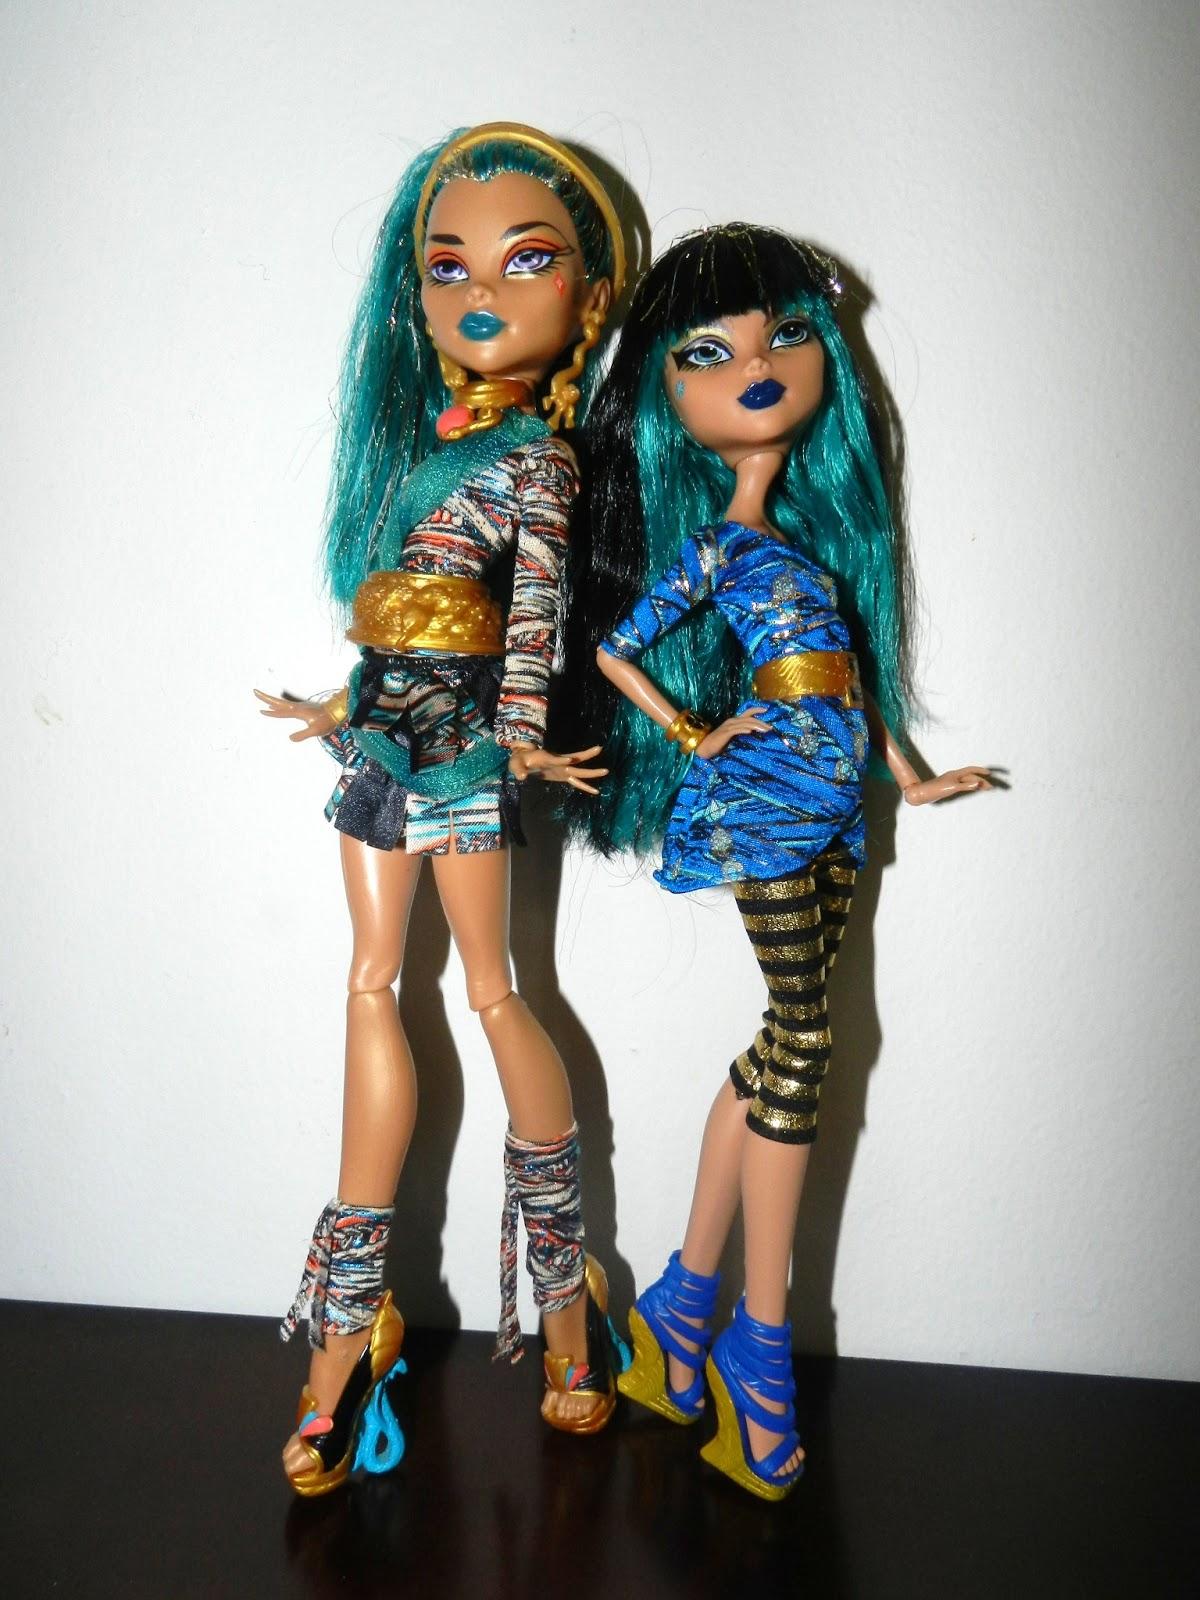 Monster High Original Favorites Cleo de Nile Doll   The ...